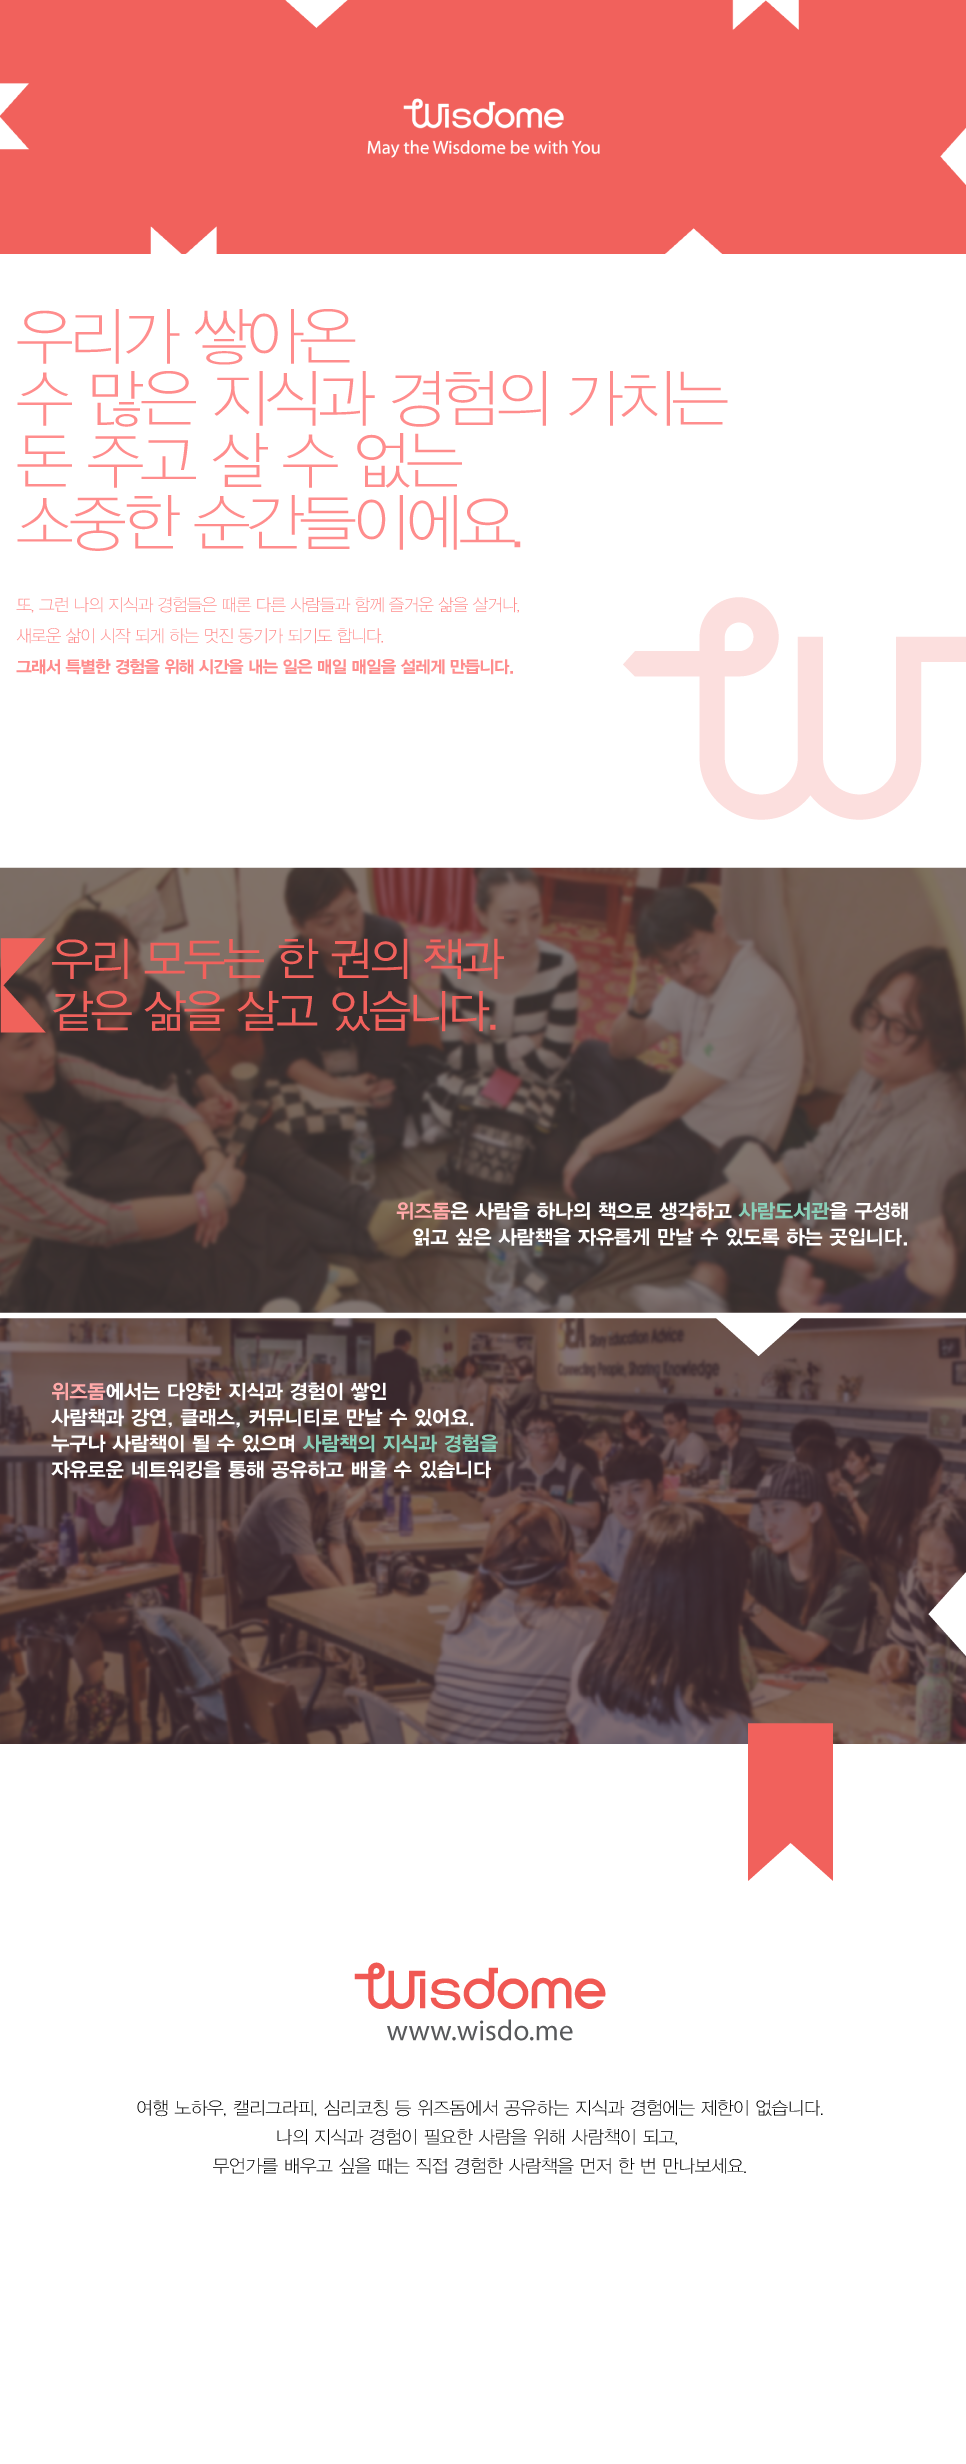 /home/cckorea/www/sharehub 2015 kr/docroot/wp content/uploads/2015/11/d7ec6805d32092a241eb